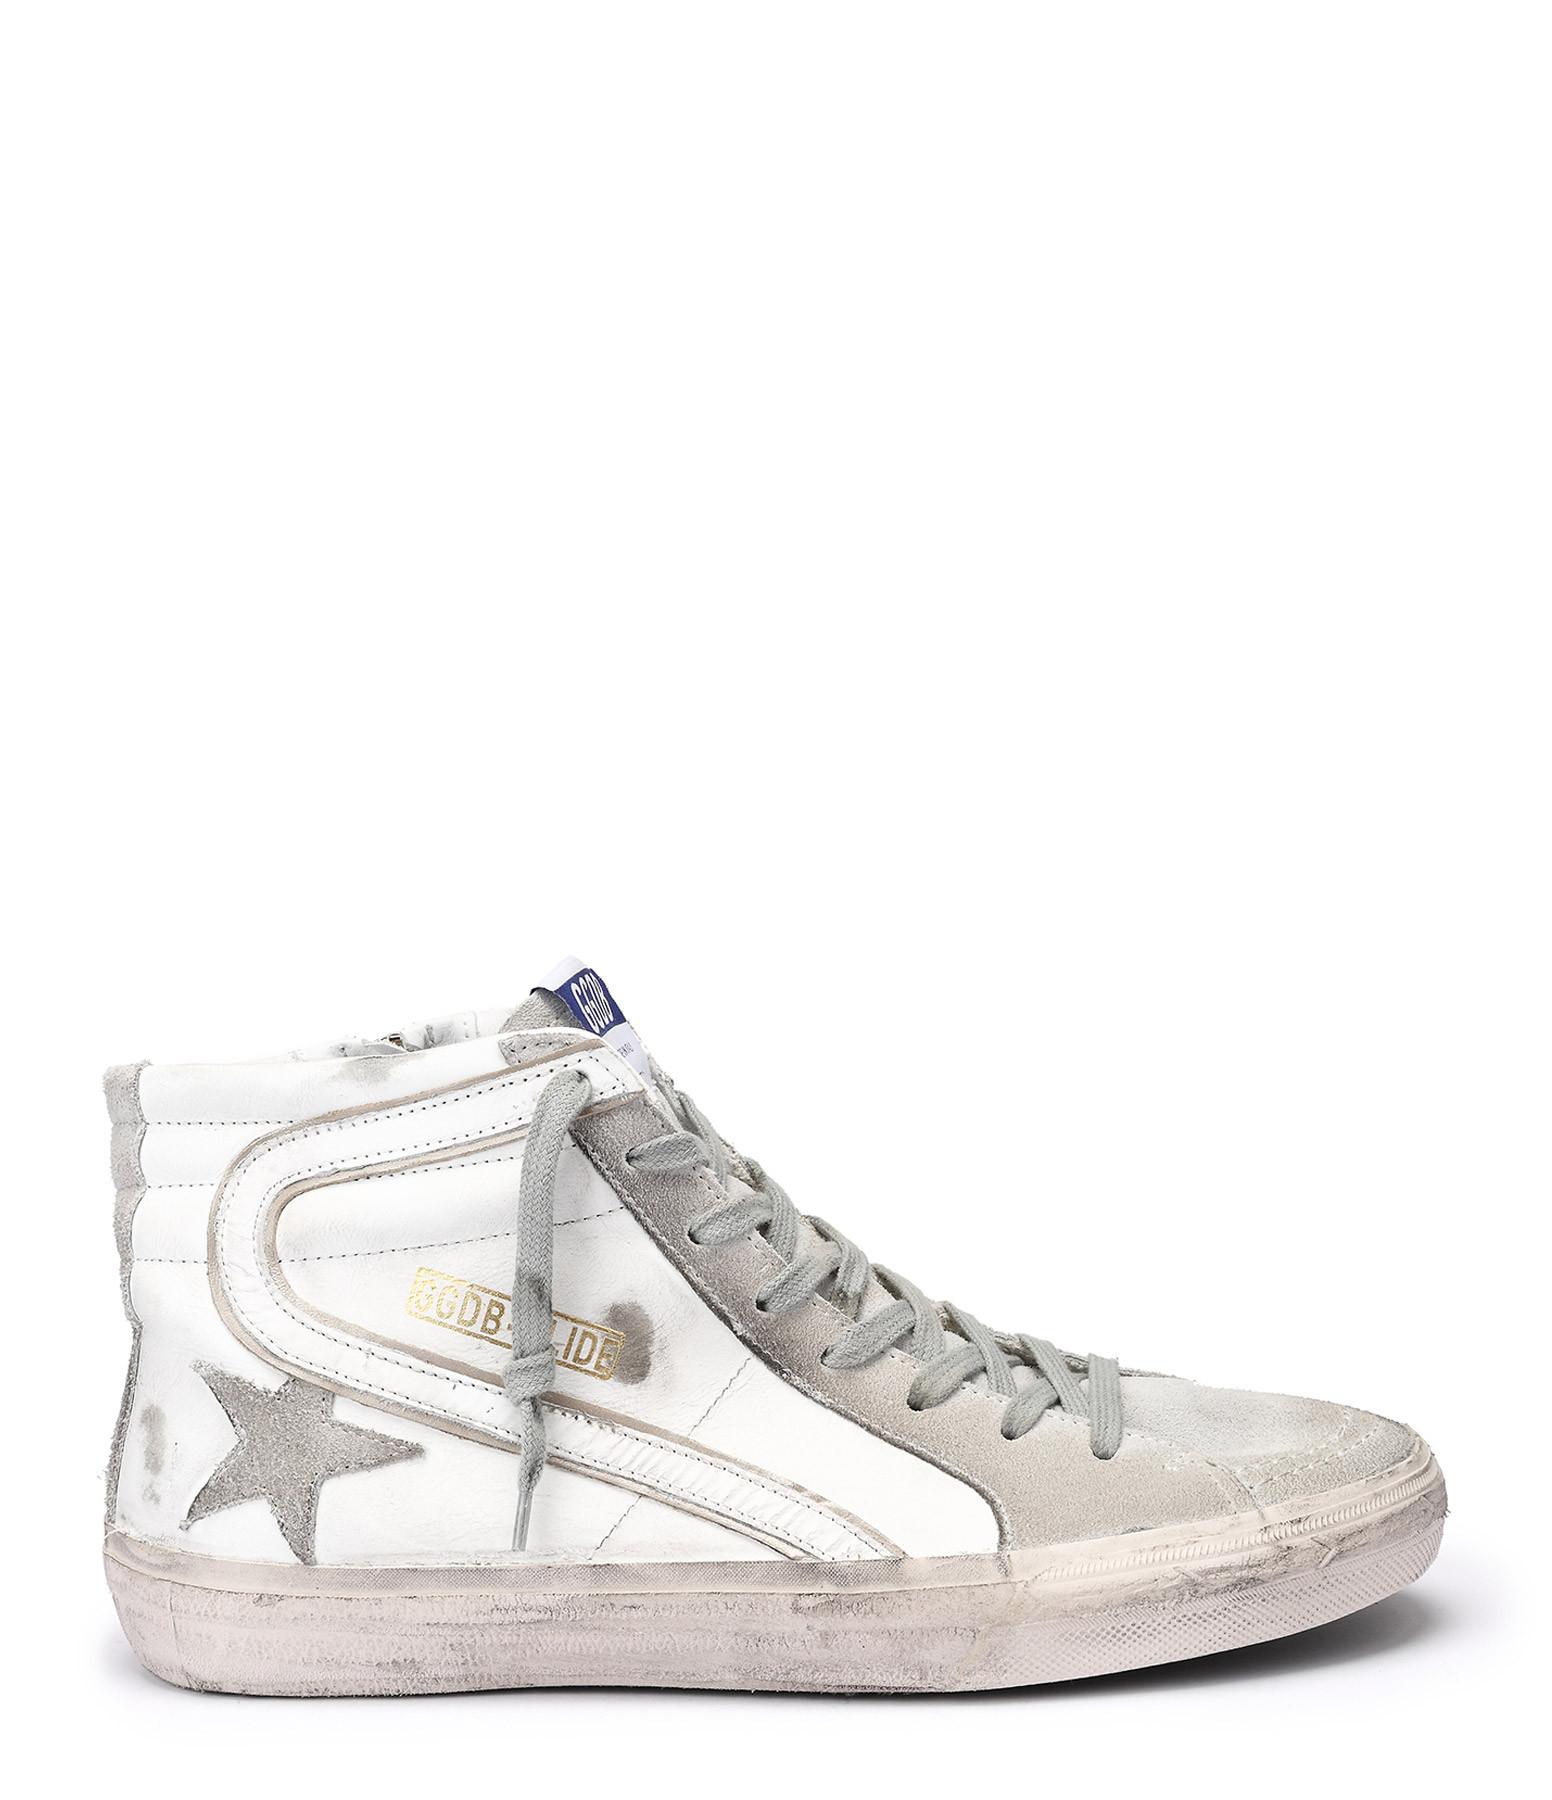 Sneakers Slide Homme Cuir Blanc - GOLDEN GOOSE